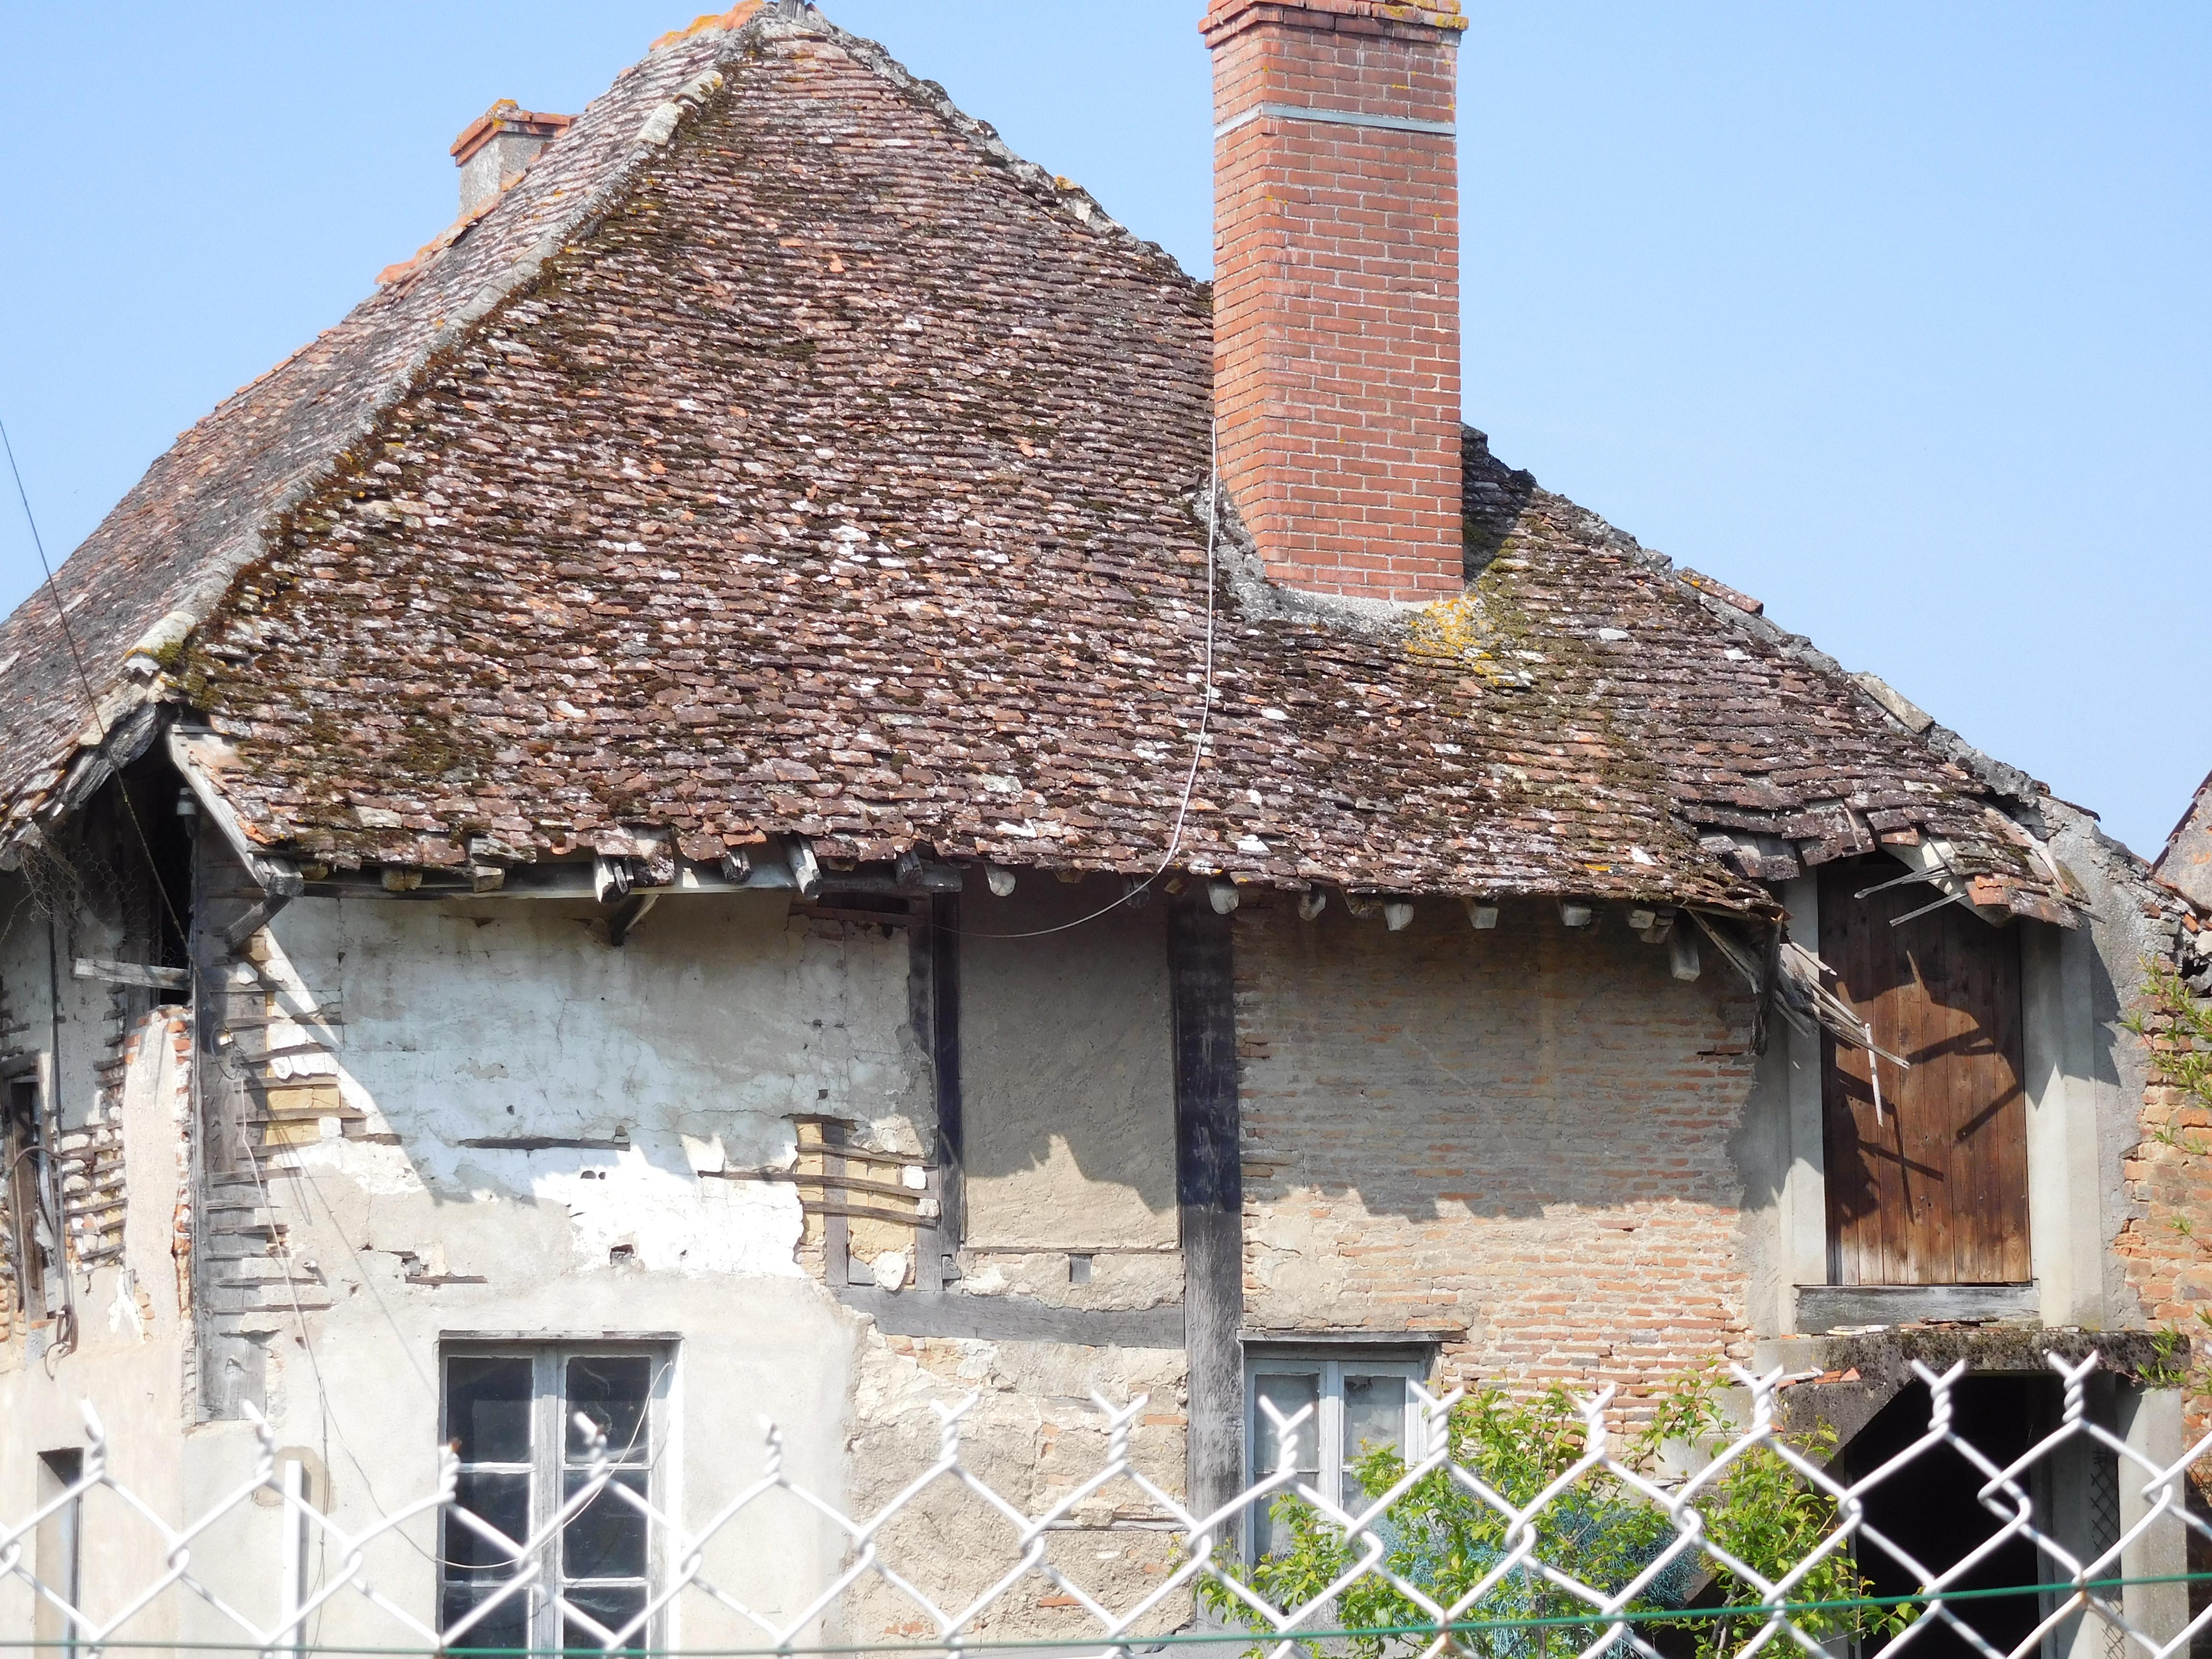 Alterations, repairs and refurbishments